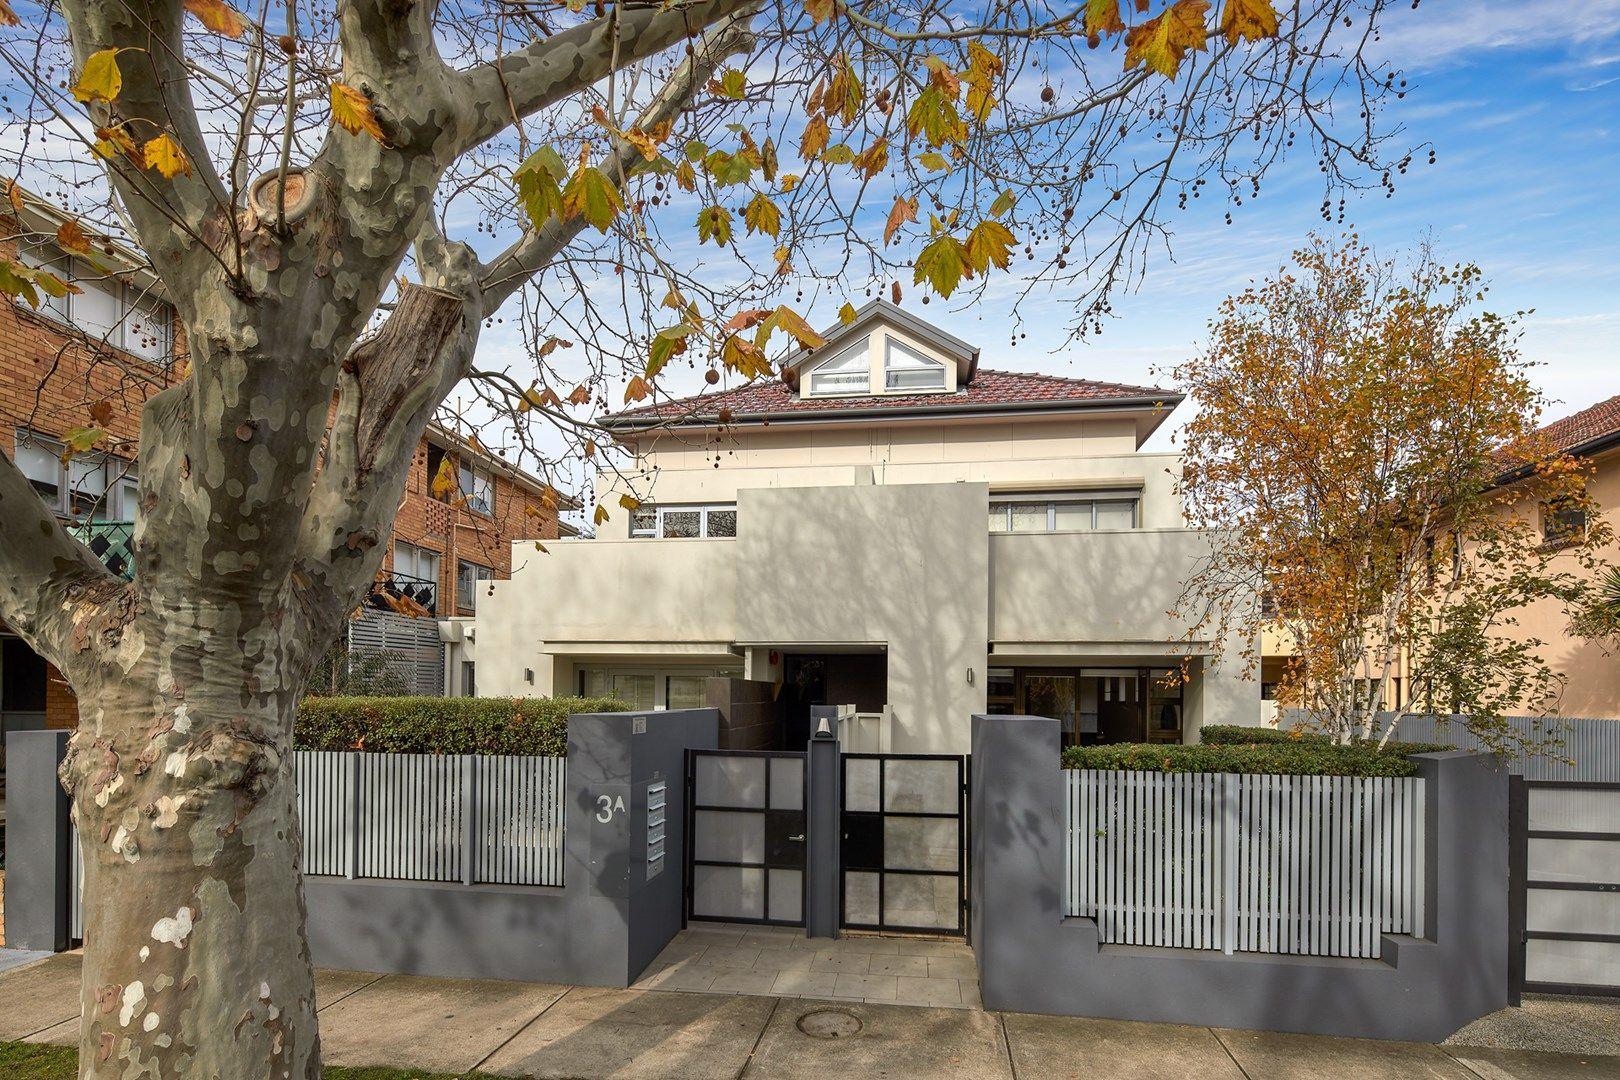 2/3A Wimbledon Avenue, Elwood VIC 3184, Image 1